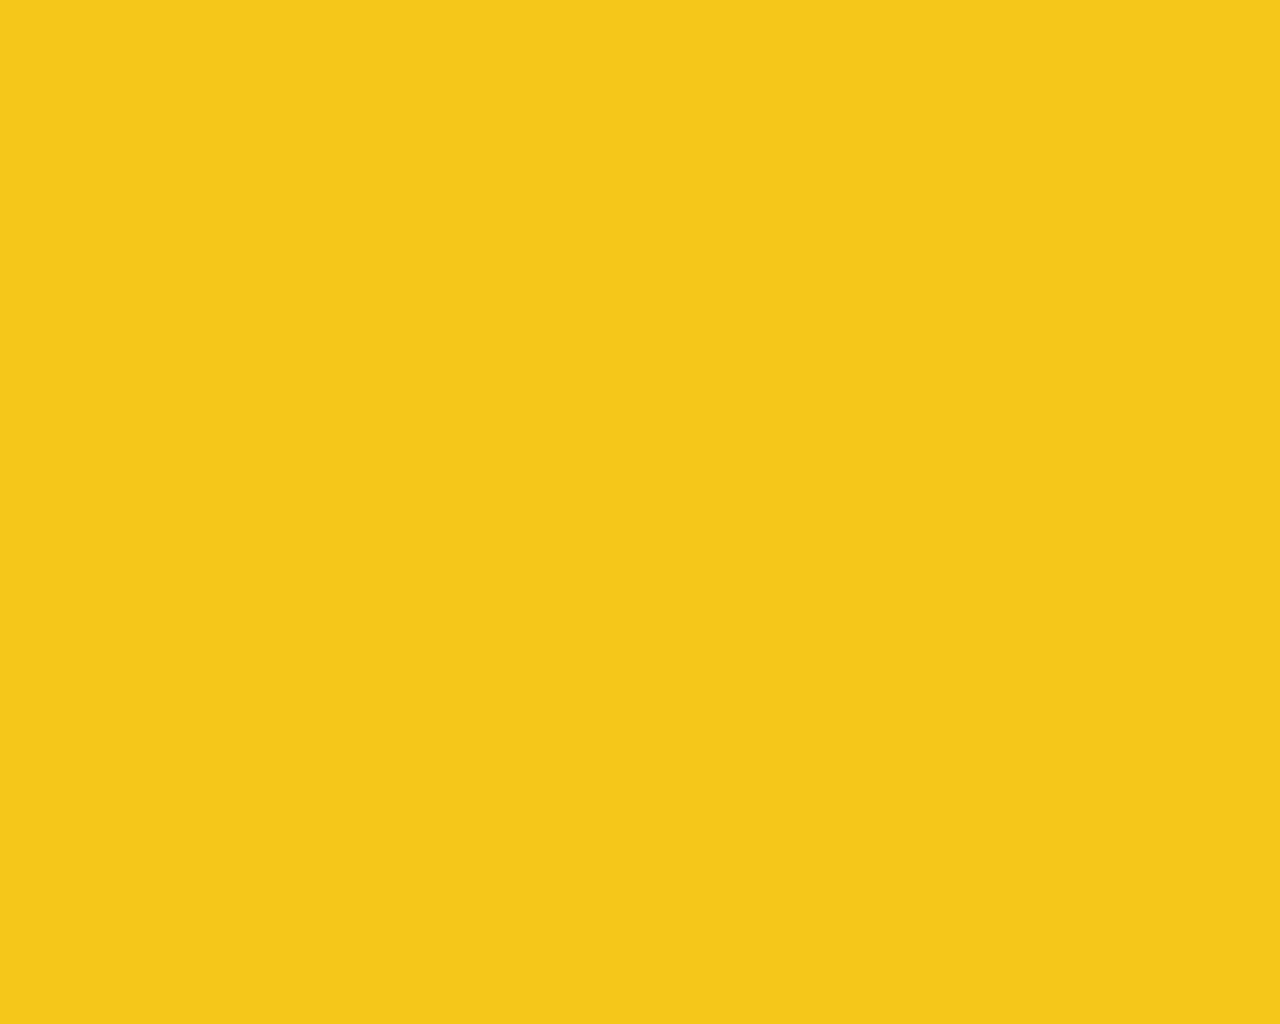 1280x1024 Deep Lemon Solid Color Background